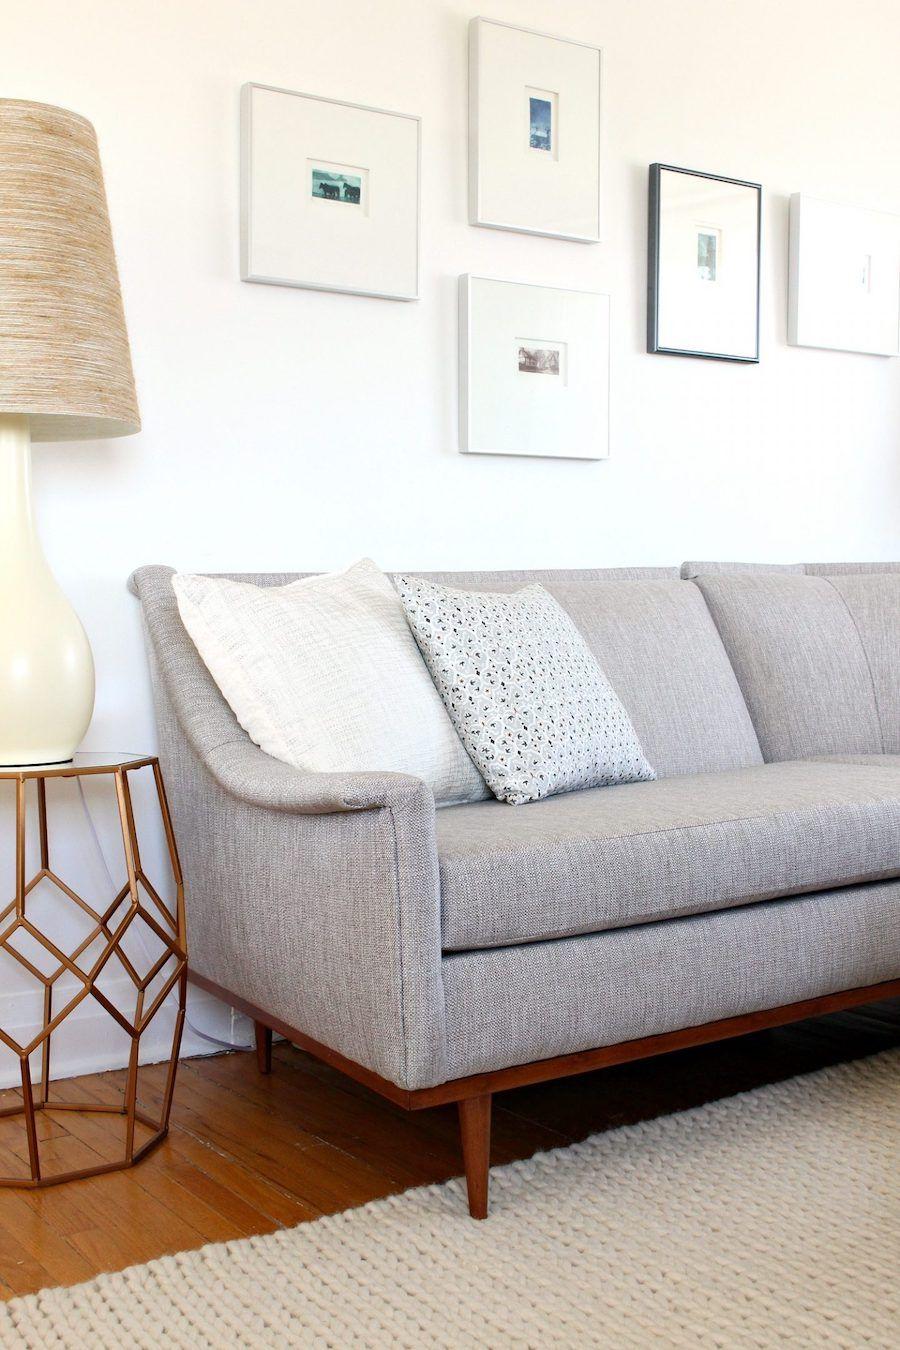 Gray mid-century modern sofa in living room